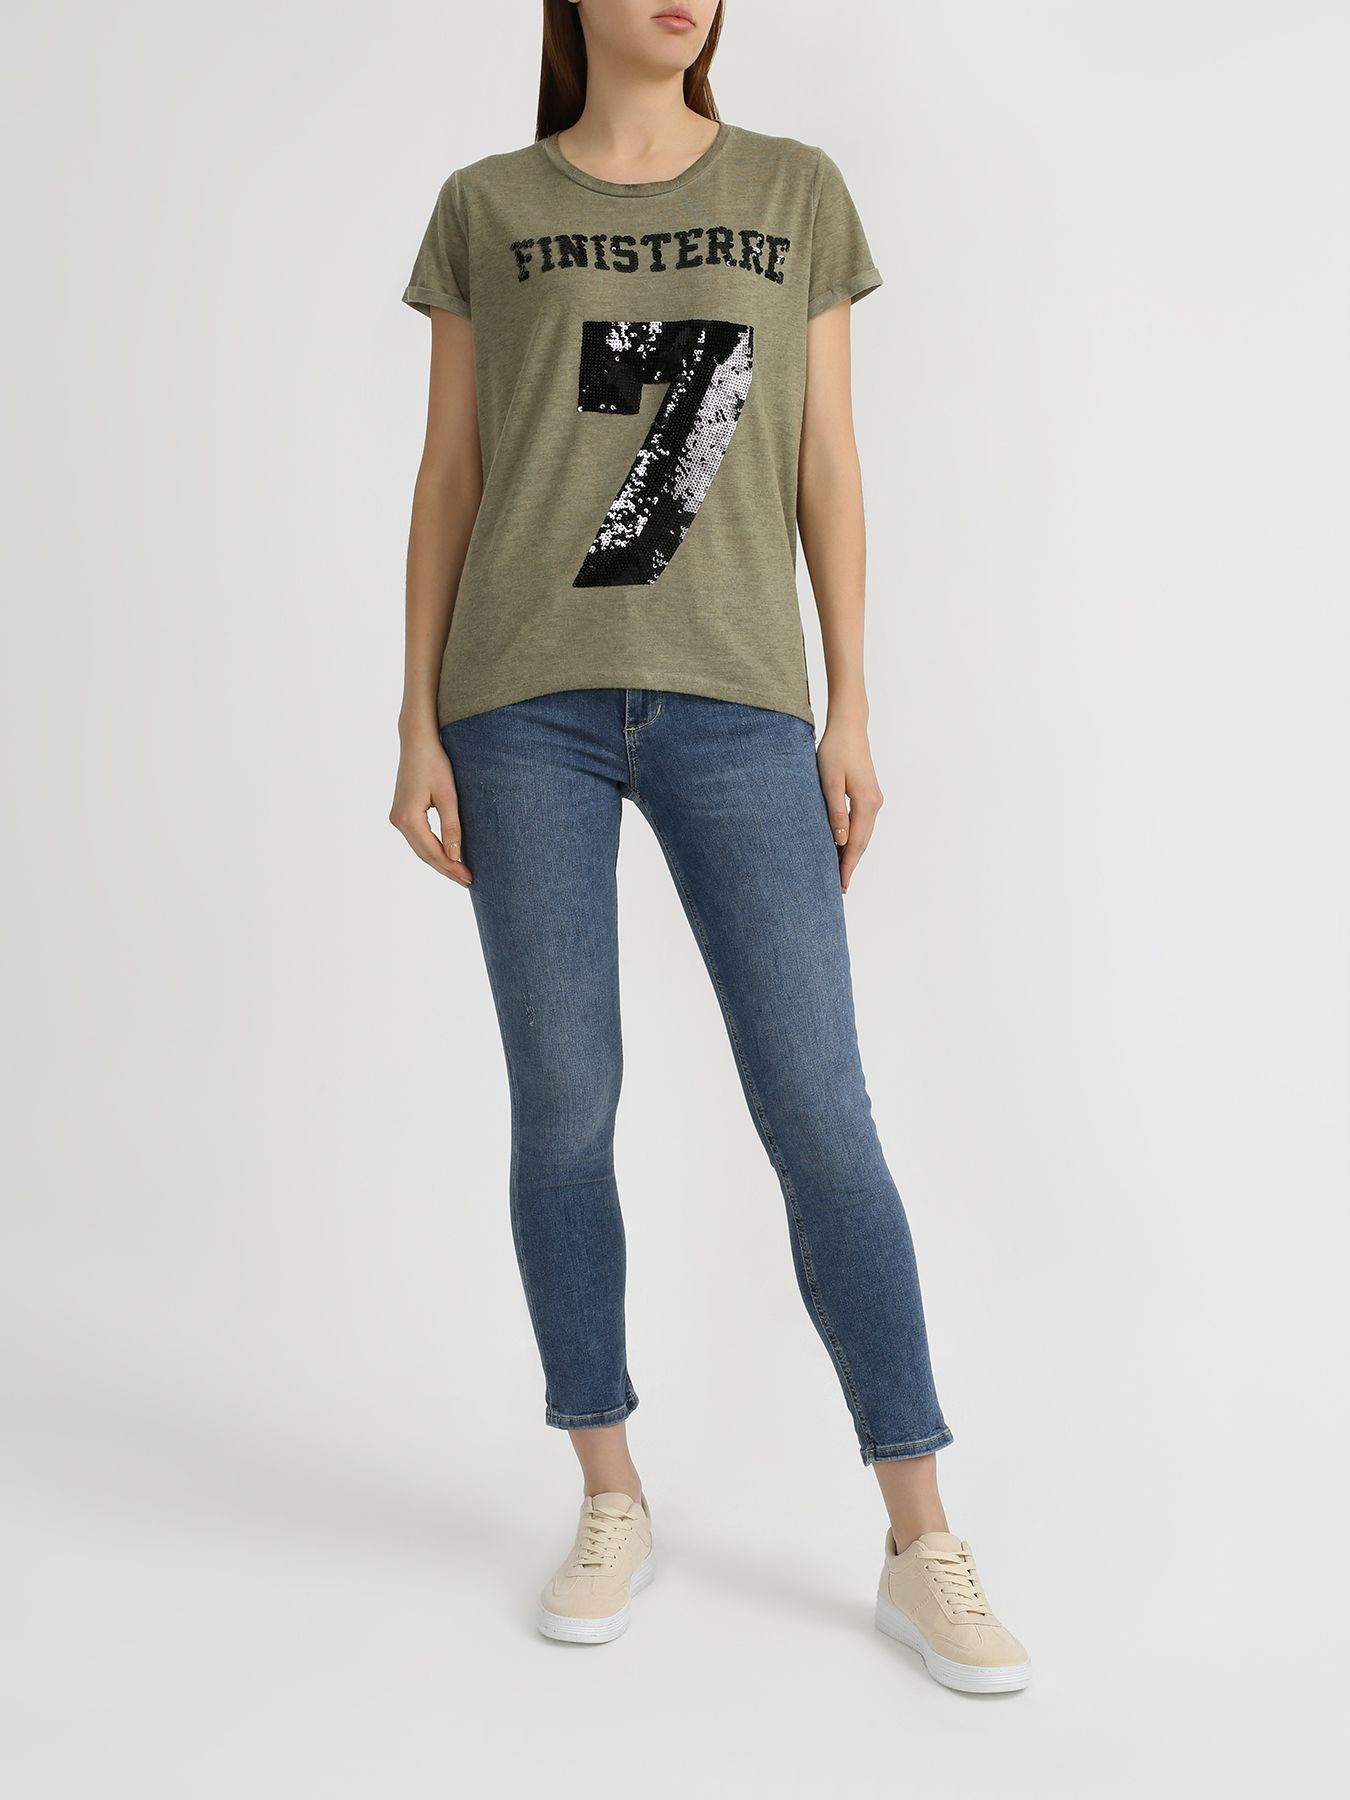 Джемпер Finisterre Женская футболка с пайетками ostin джемпер с пайетками